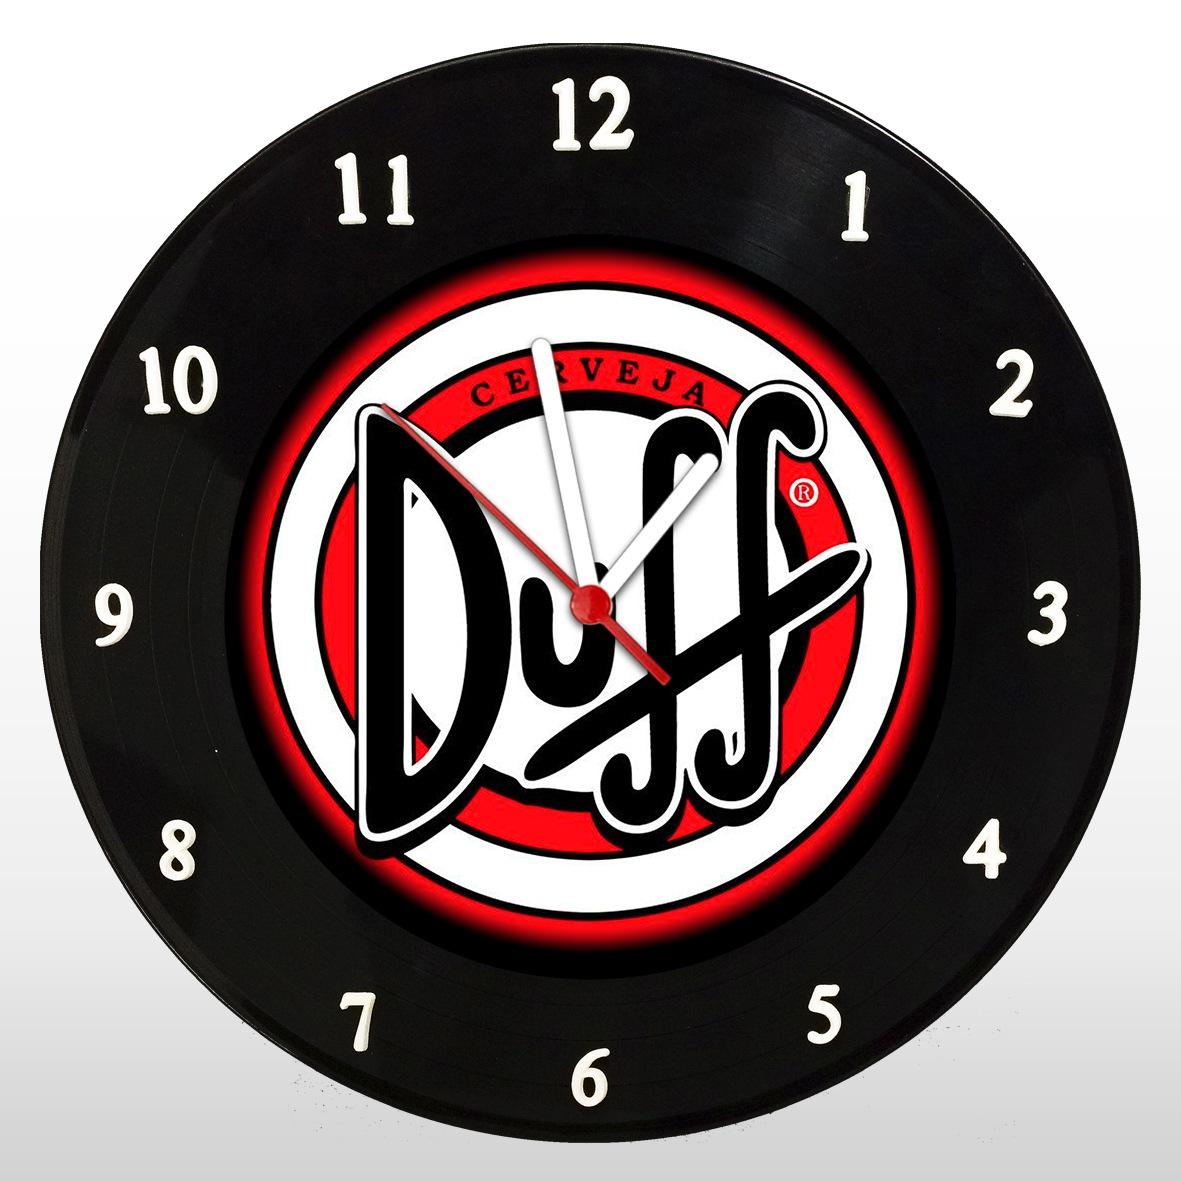 Duff - The Simpsons - Relógio de Parede em Disco de Vinil - Mr. Rock